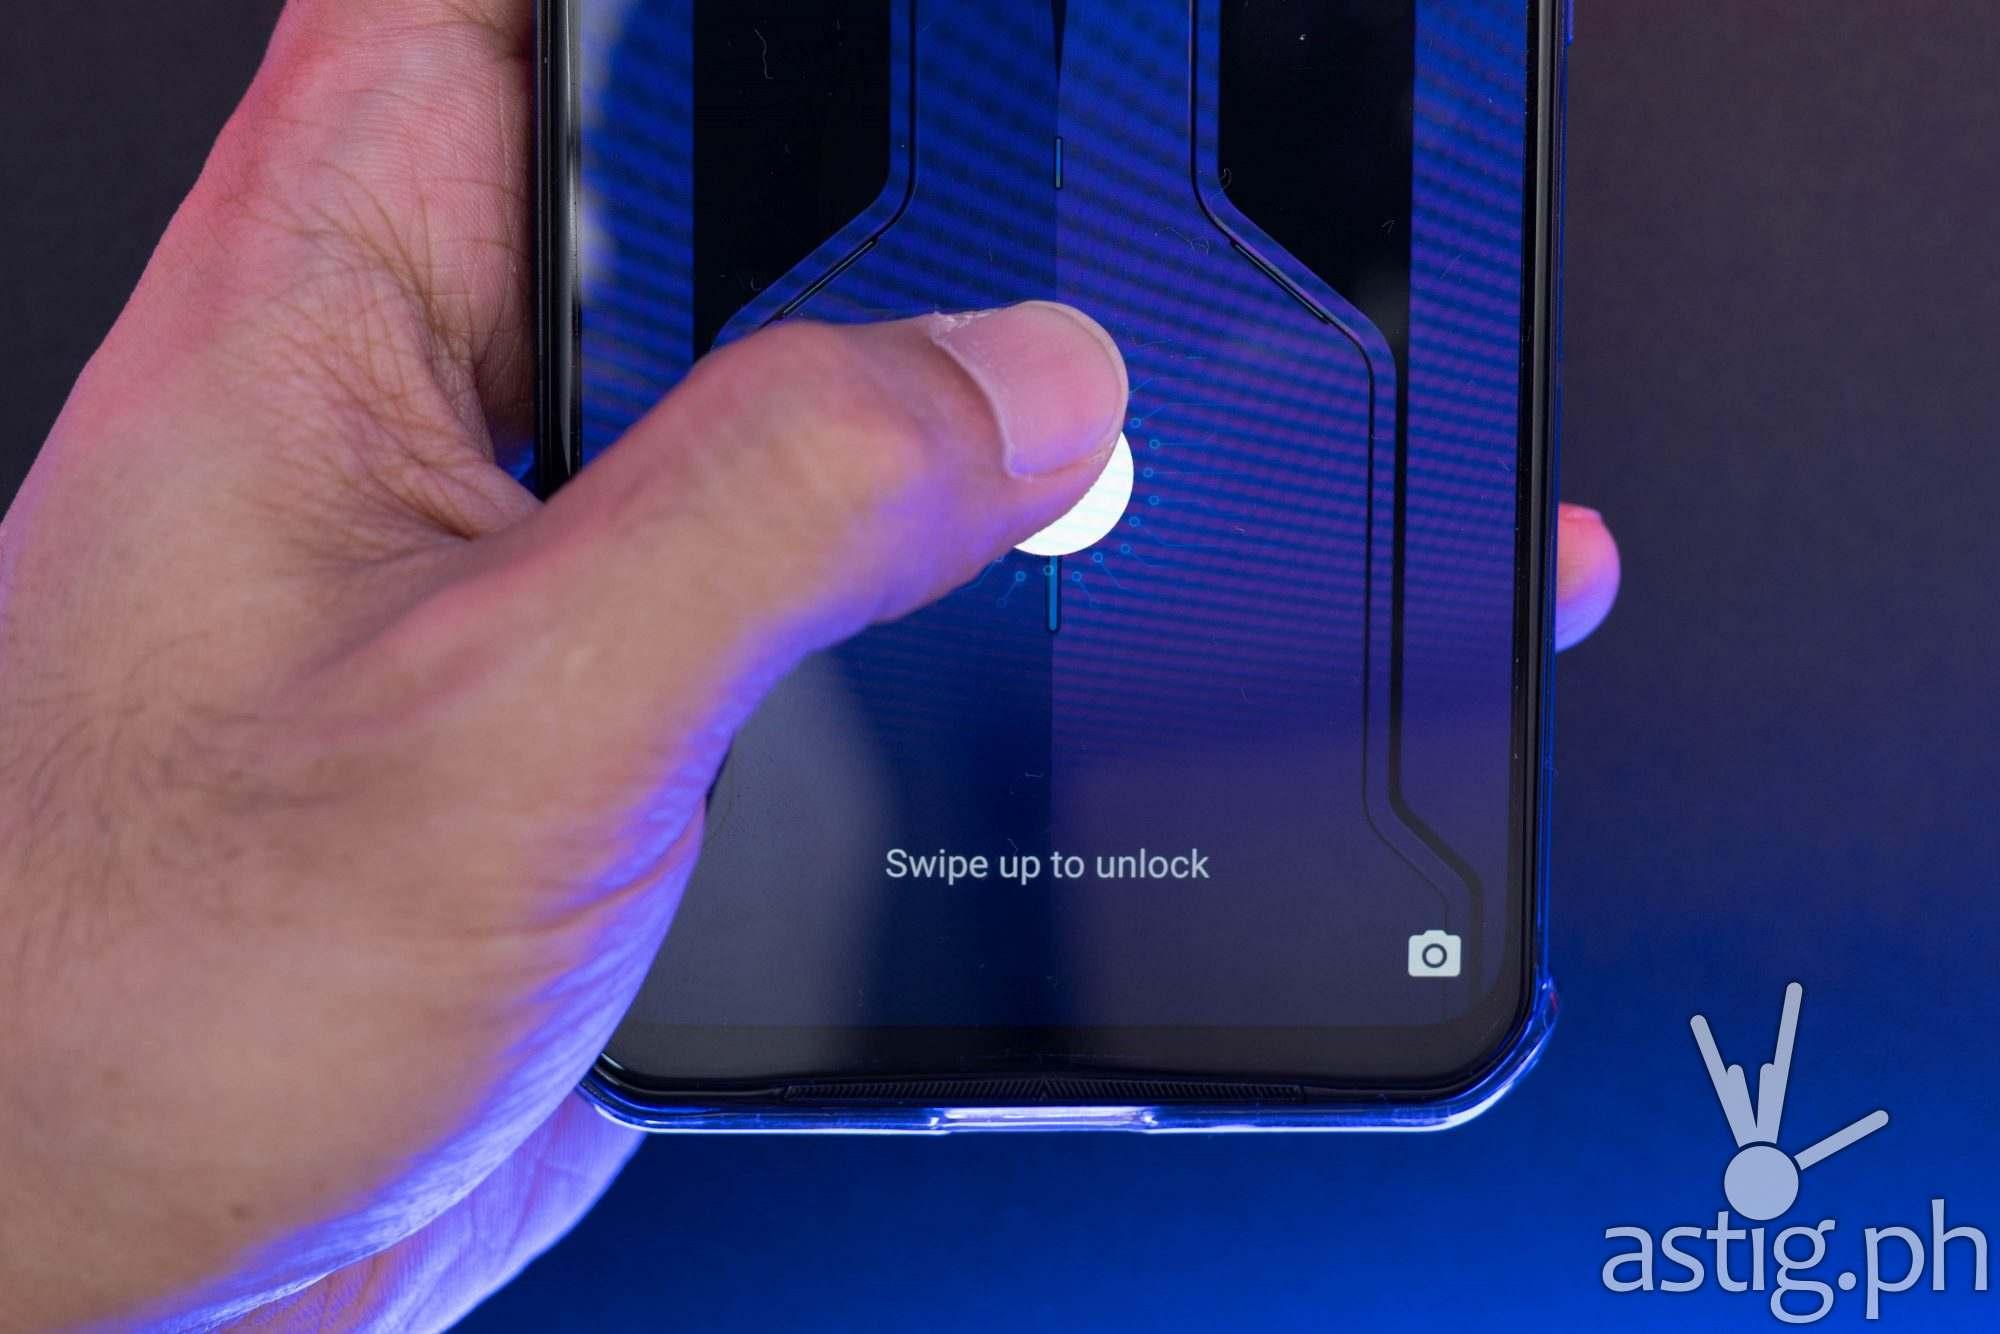 Under-display fingerprint scanner - Legion Phone Duel 2 (Philippines)